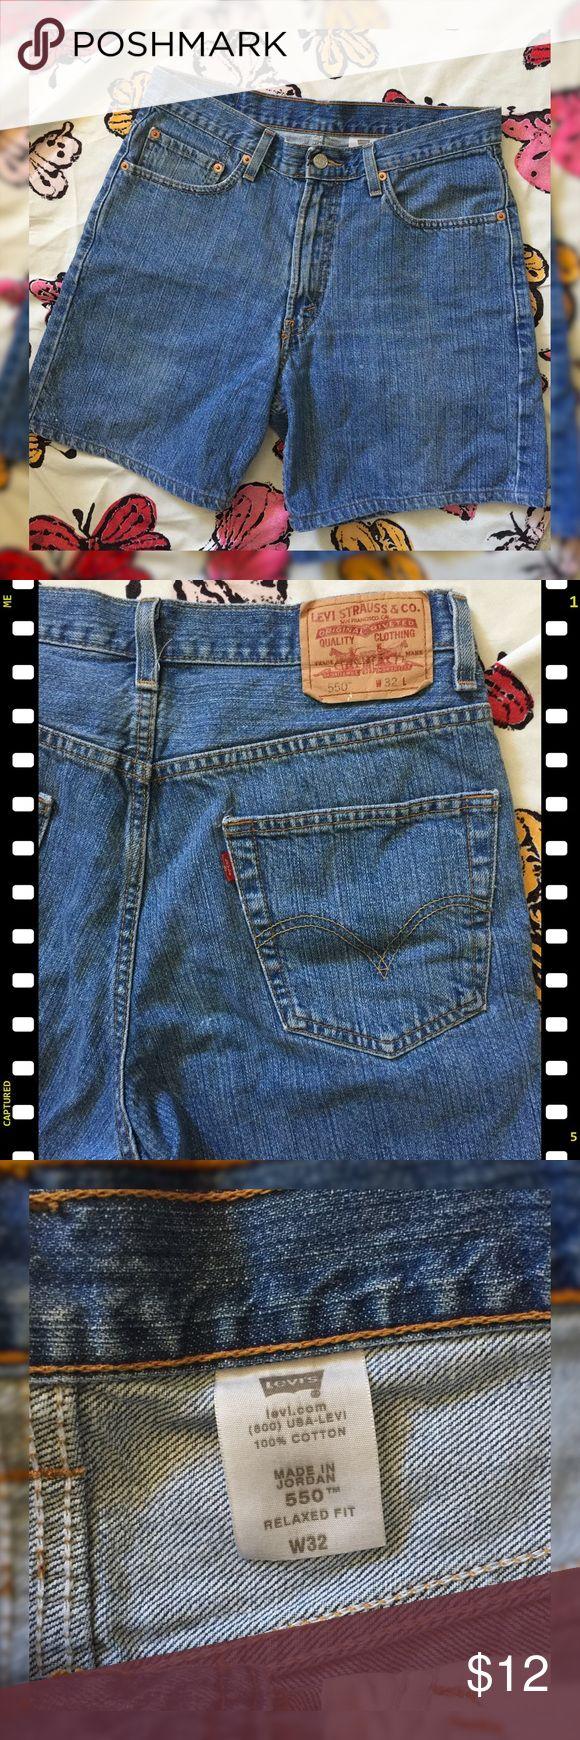 Levi's 550 High waisted Shorts Levi's 550 High Waisted Jean Shorts. Levi's Shorts Jean Shorts